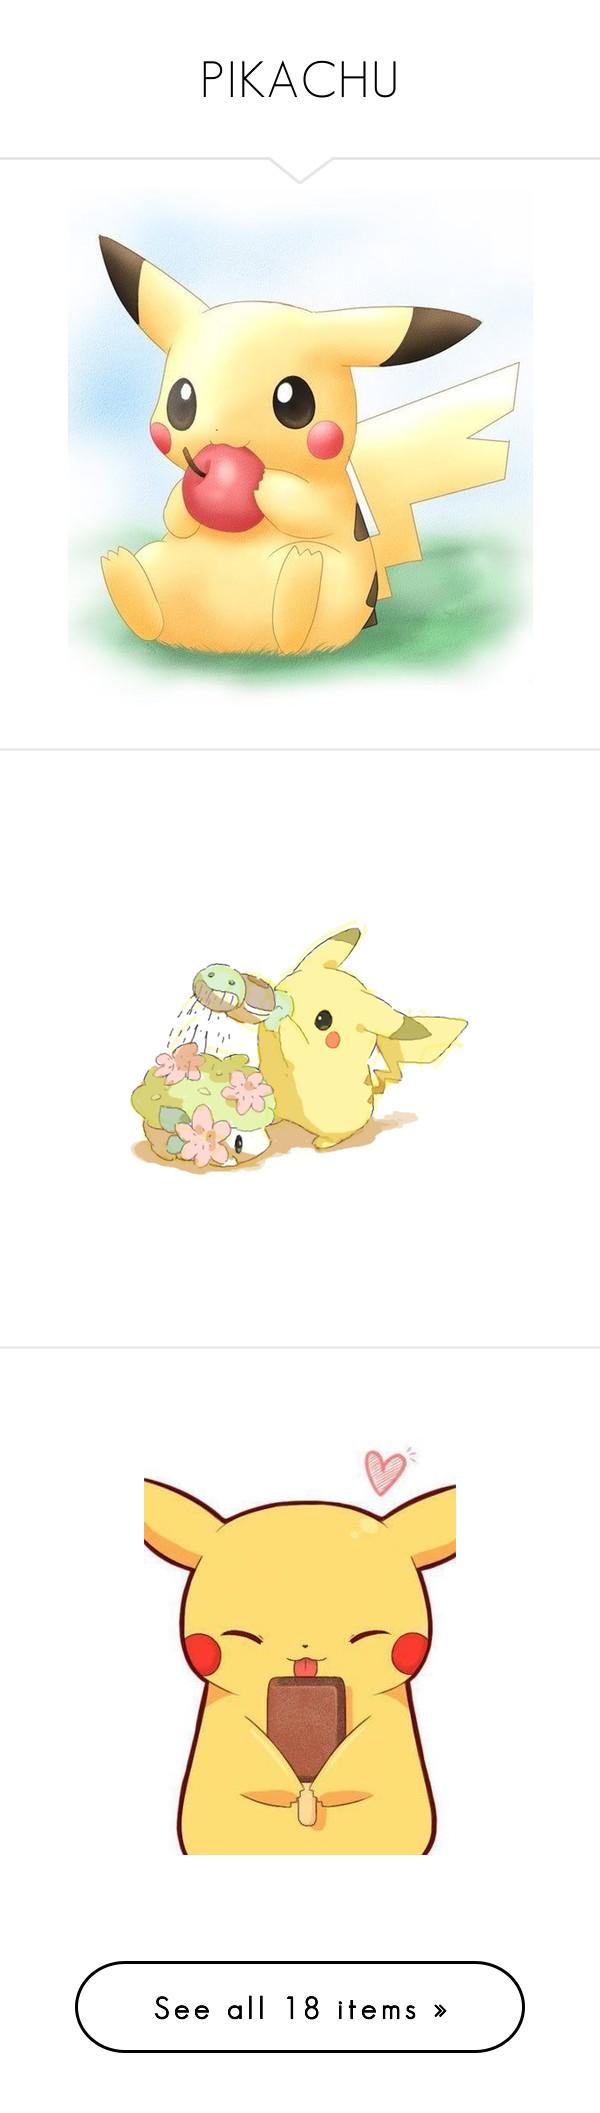 Uncategorized Pokémon Drawings pikachu by coolcat000 liked on polyvore featuring anime